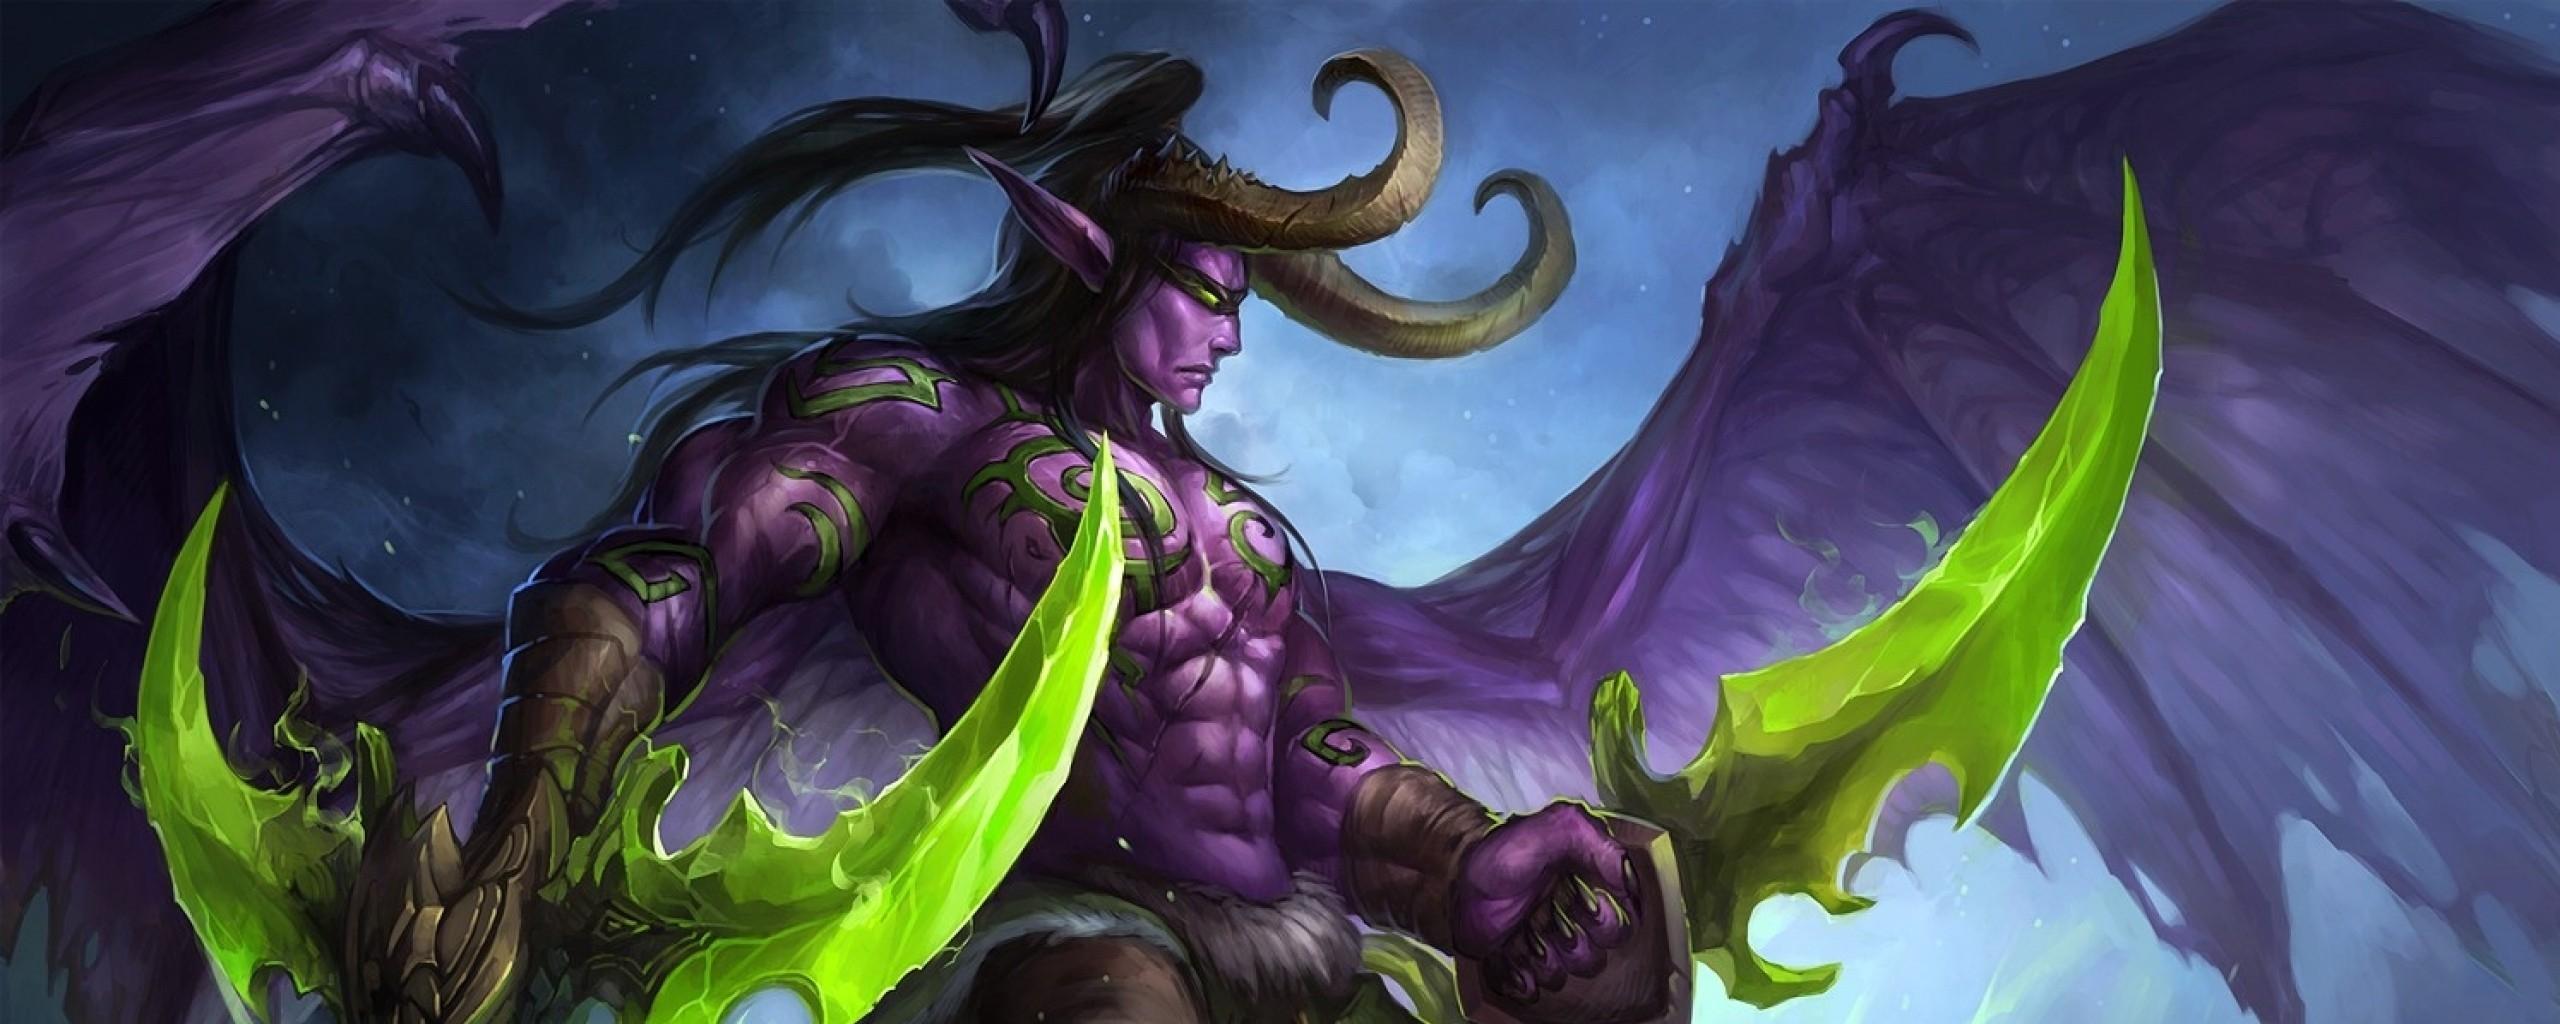 2560x1024 World Of Warcraft Illidan Stormrage Art 2560x1024